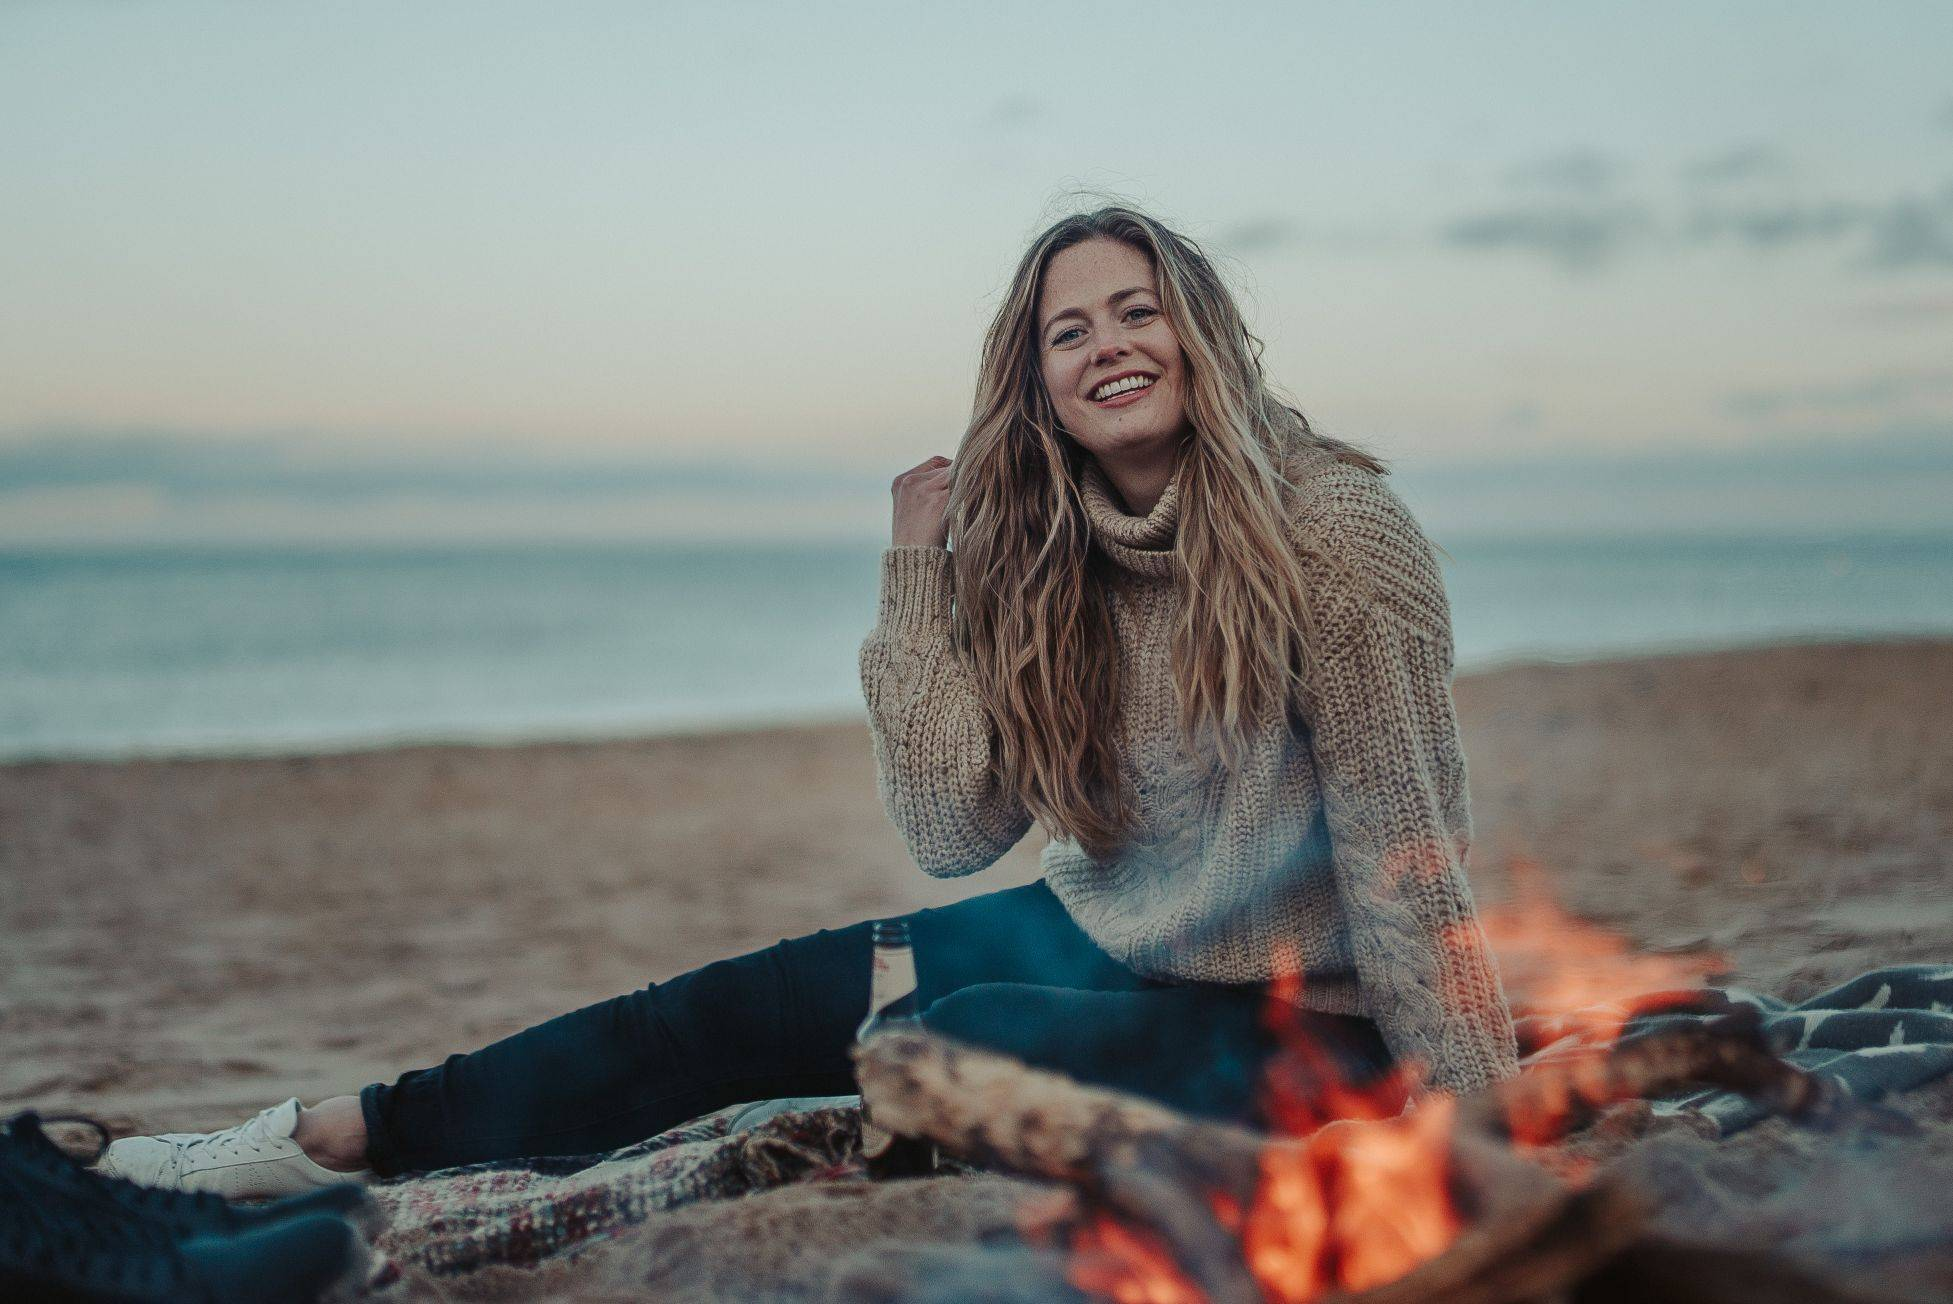 Image of Abi on beach